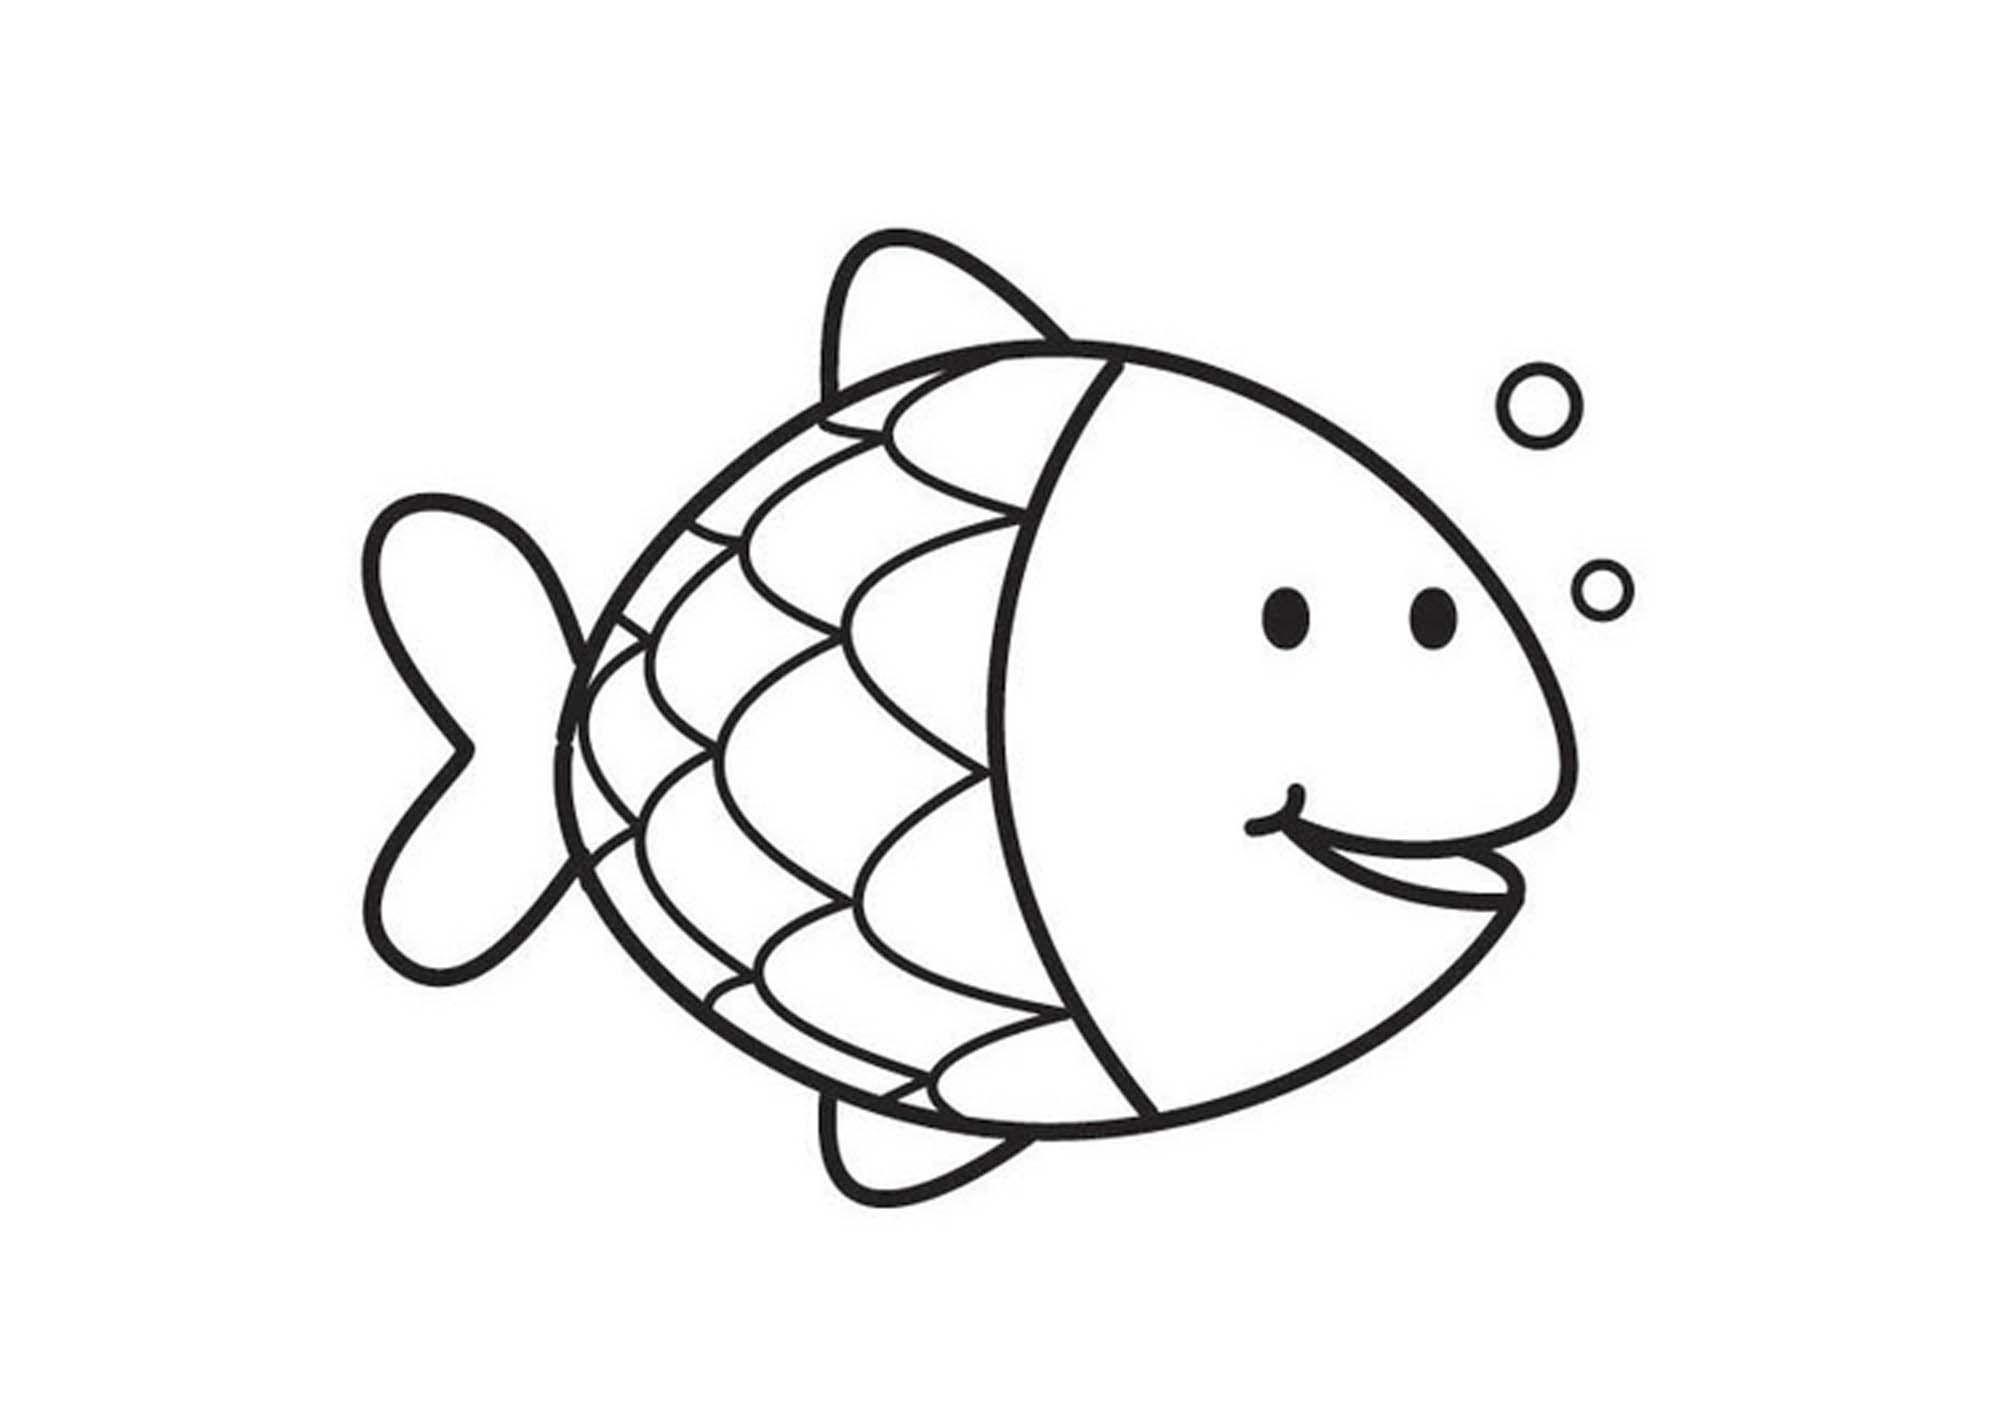 Small Fish Drawing Google Search Fish Coloring Page Rainbow Fish Coloring Page Rainbow Fish